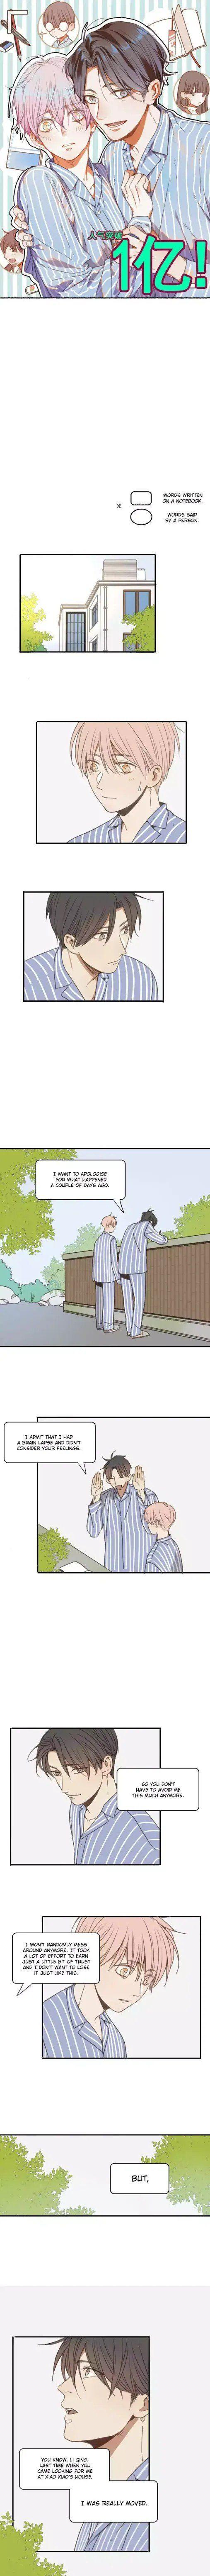 https://im.nineanime.com/comics/pic9/57/20473/449694/SilentColor210969.jpg Page 1